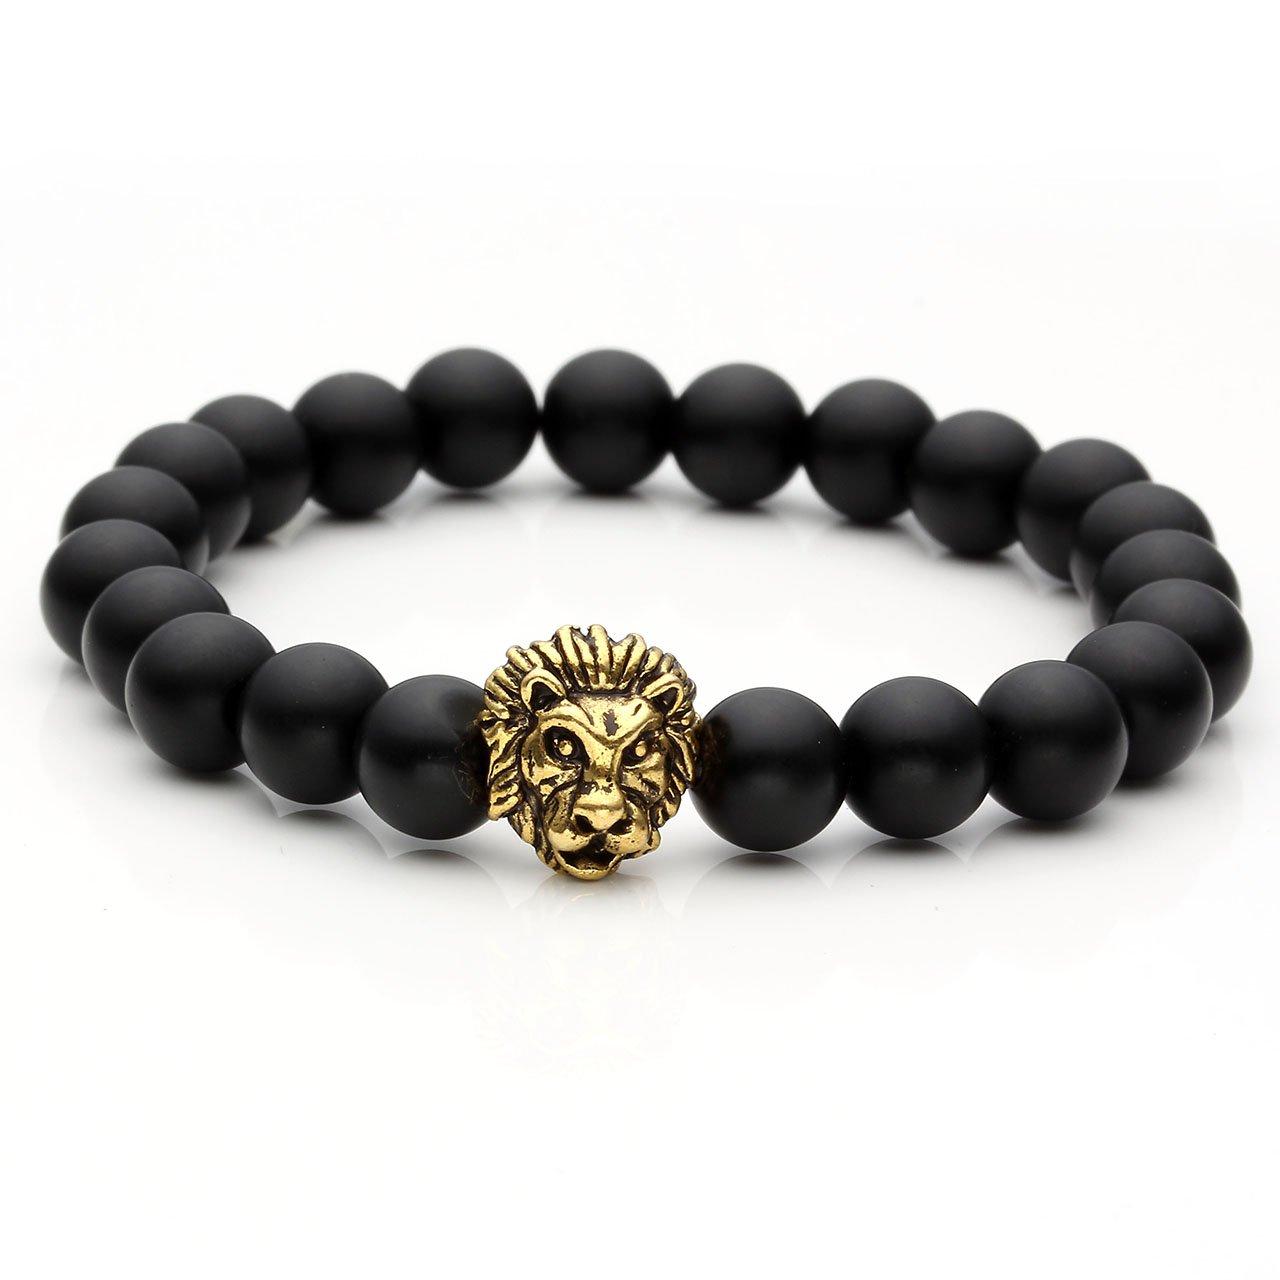 Beaded Charm Bracelets: Amazon.com: Creazy®Women Men Bracelet Lion Elastic Beaded